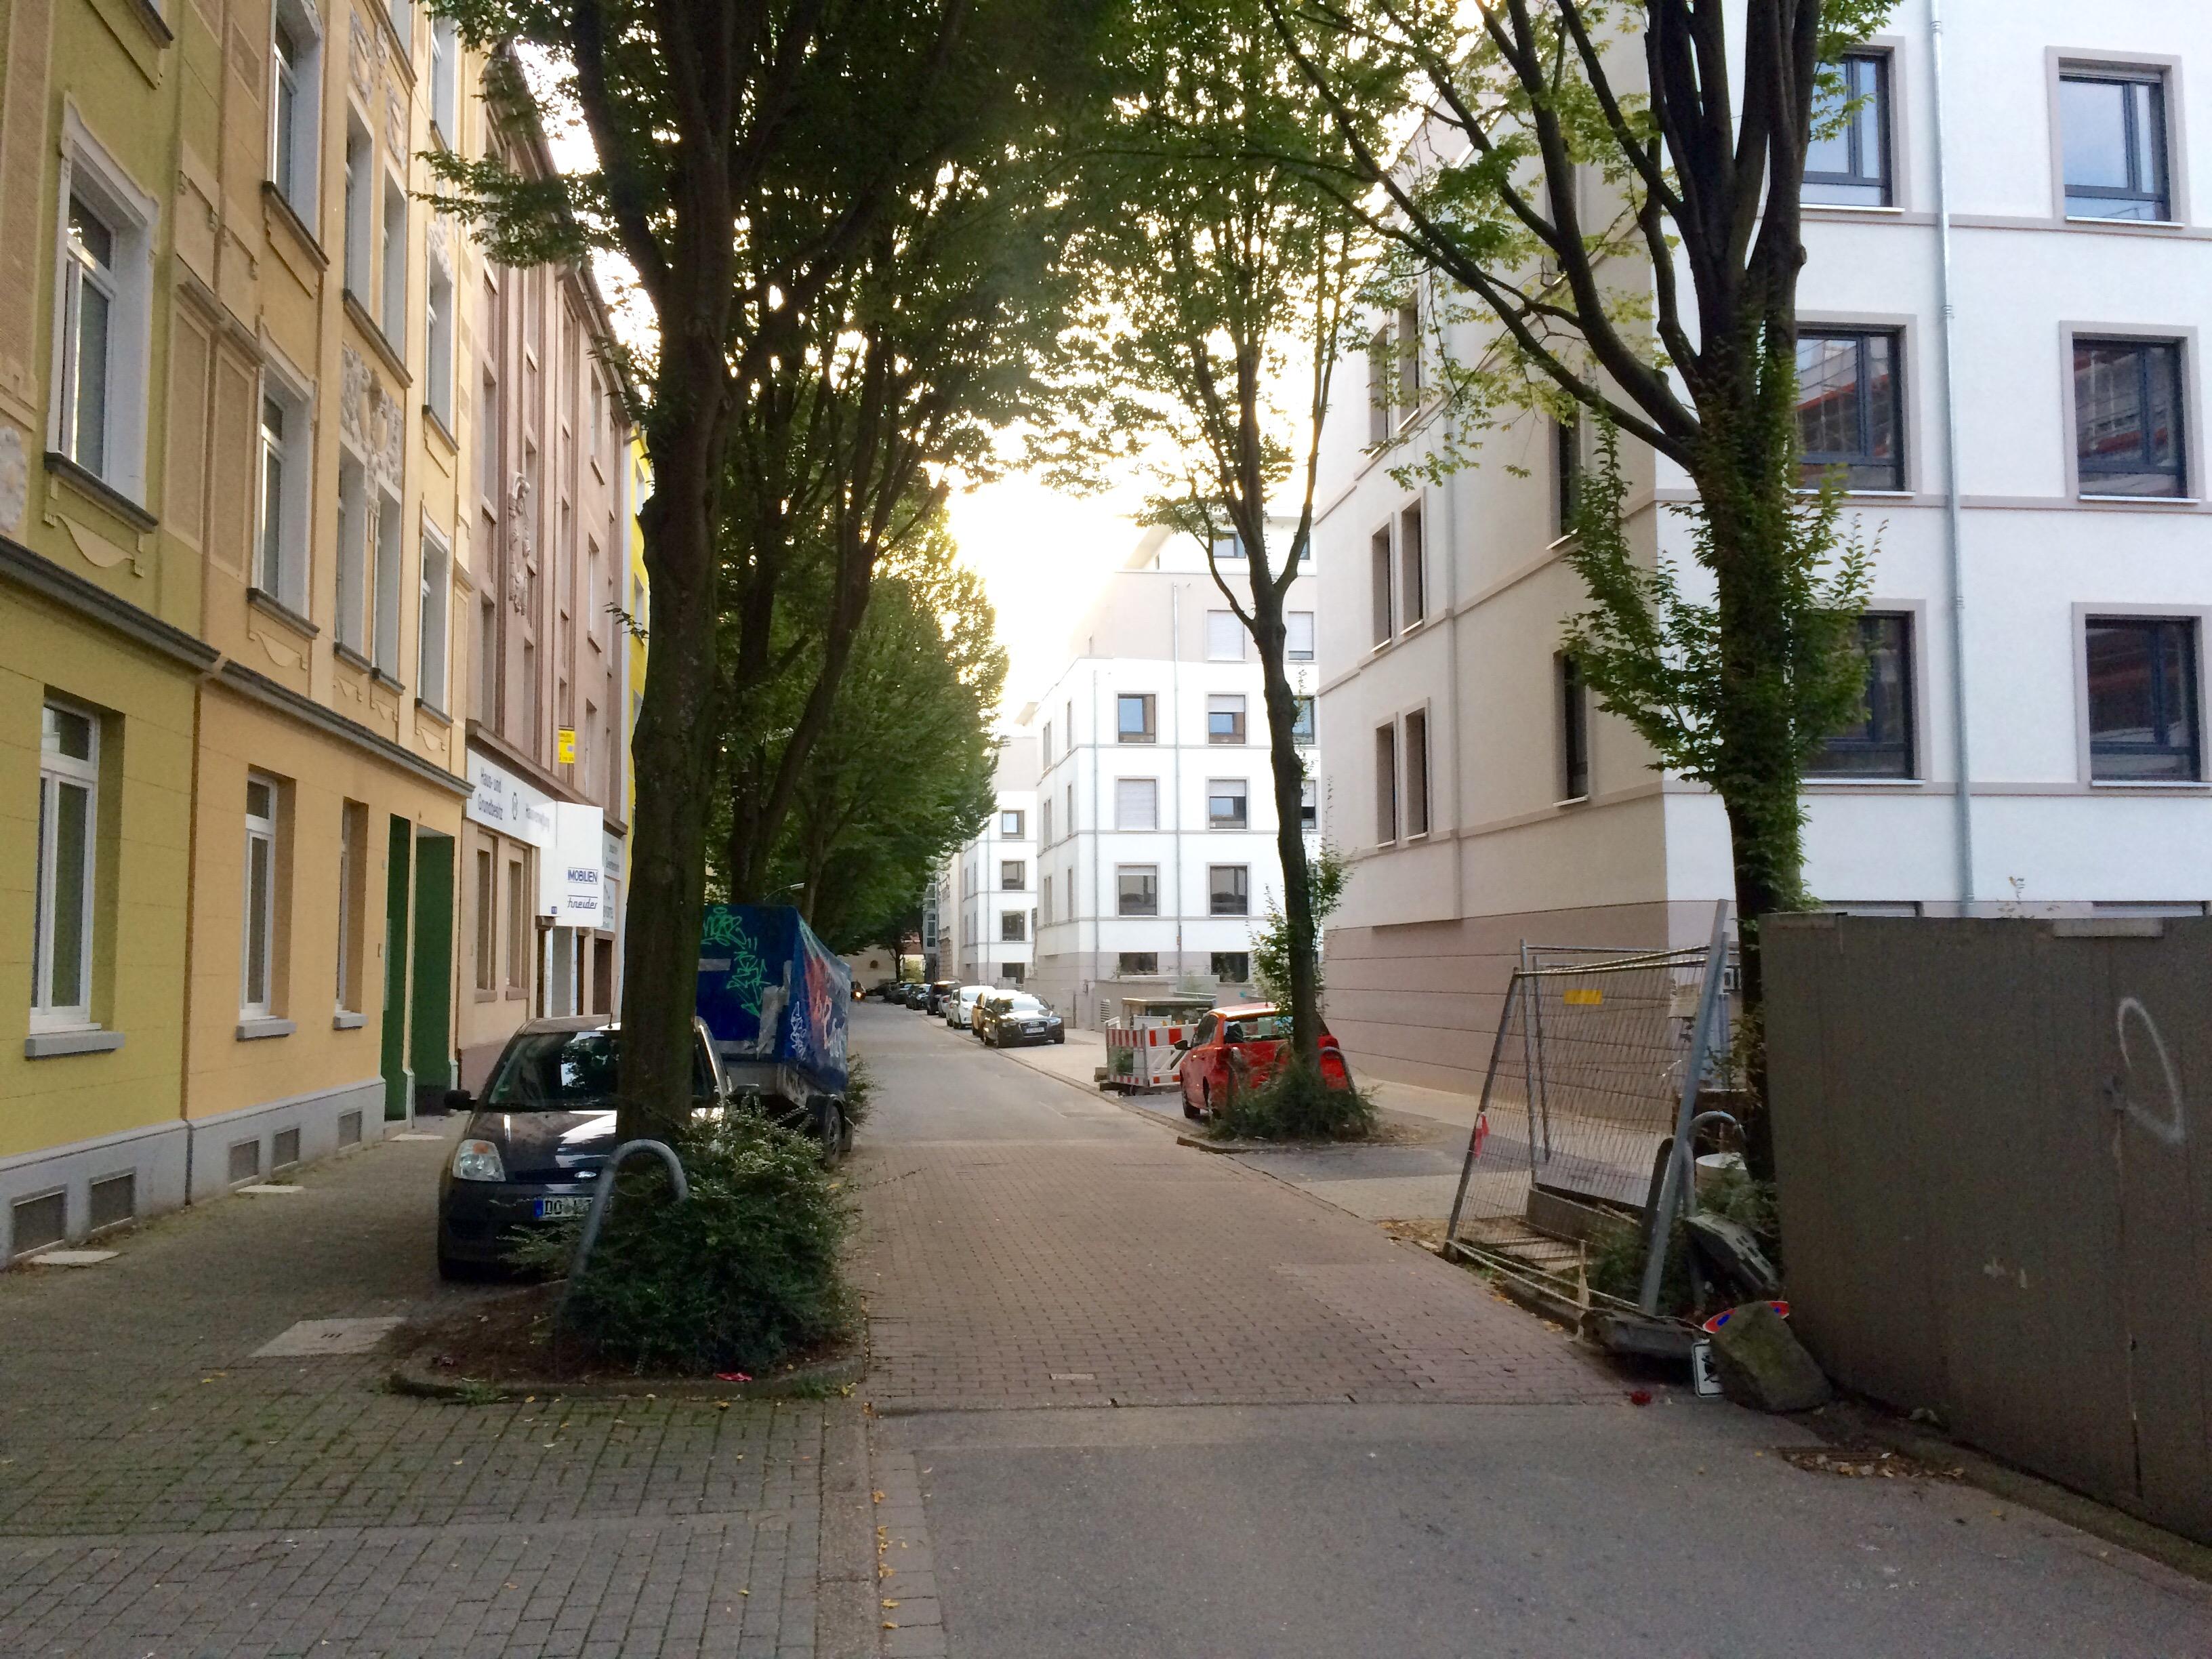 Bild: http://abload.de/img/img_9357zcuqu.jpg